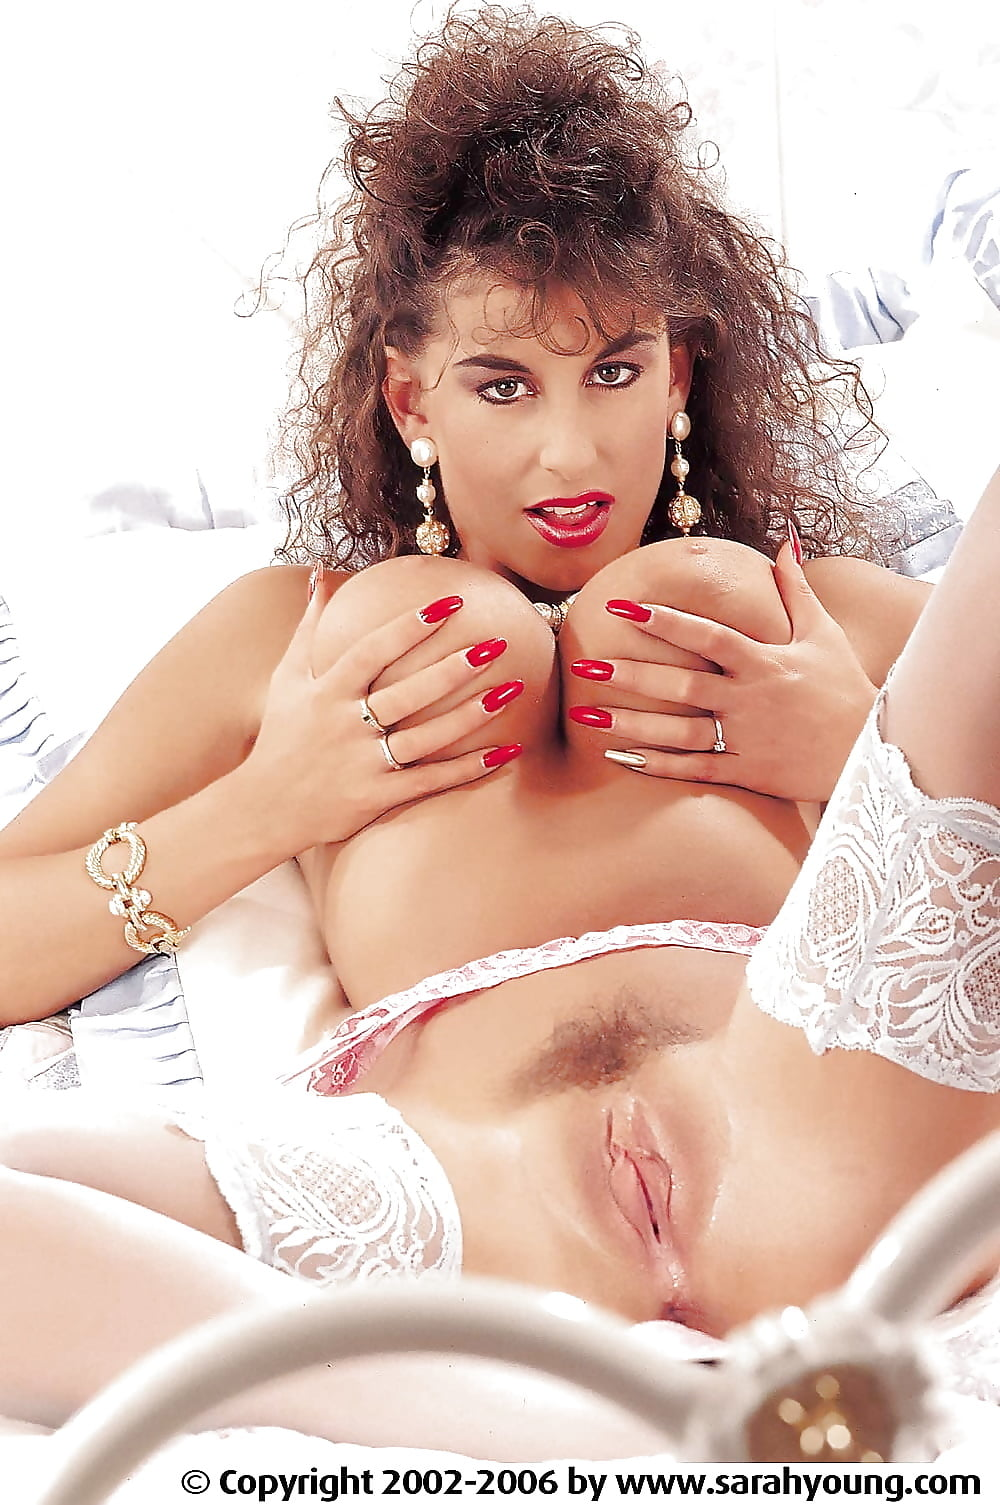 Tits sexy sarah young video face gangbang wien